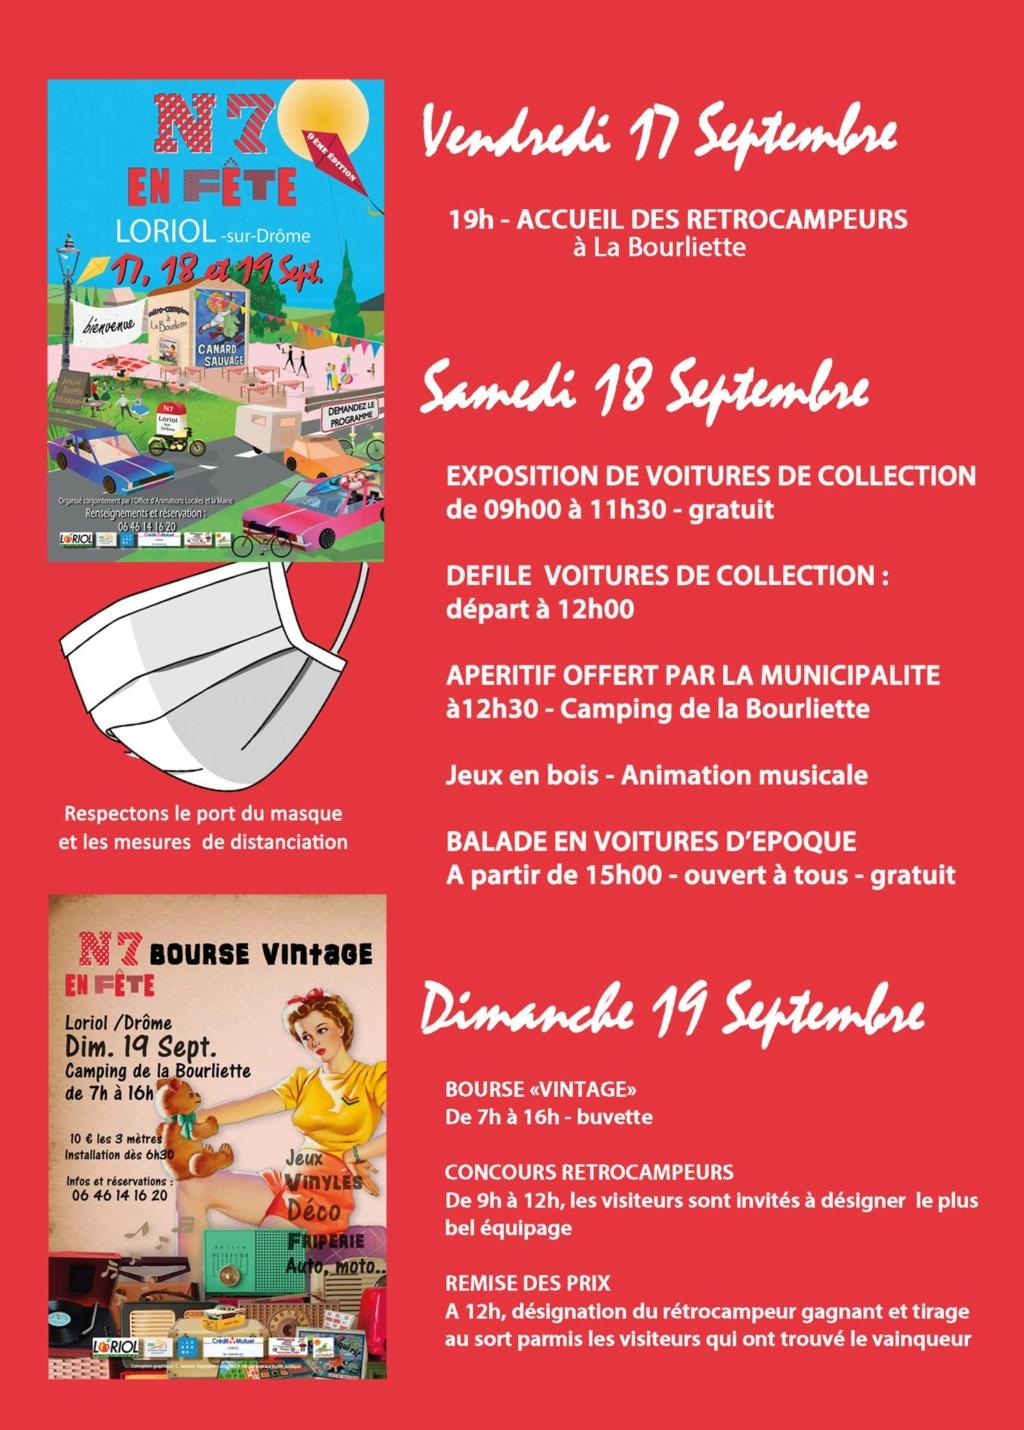 [26] 17-18-19/09/2021 - RN7 en fête à Loriol/Drôme 24162410